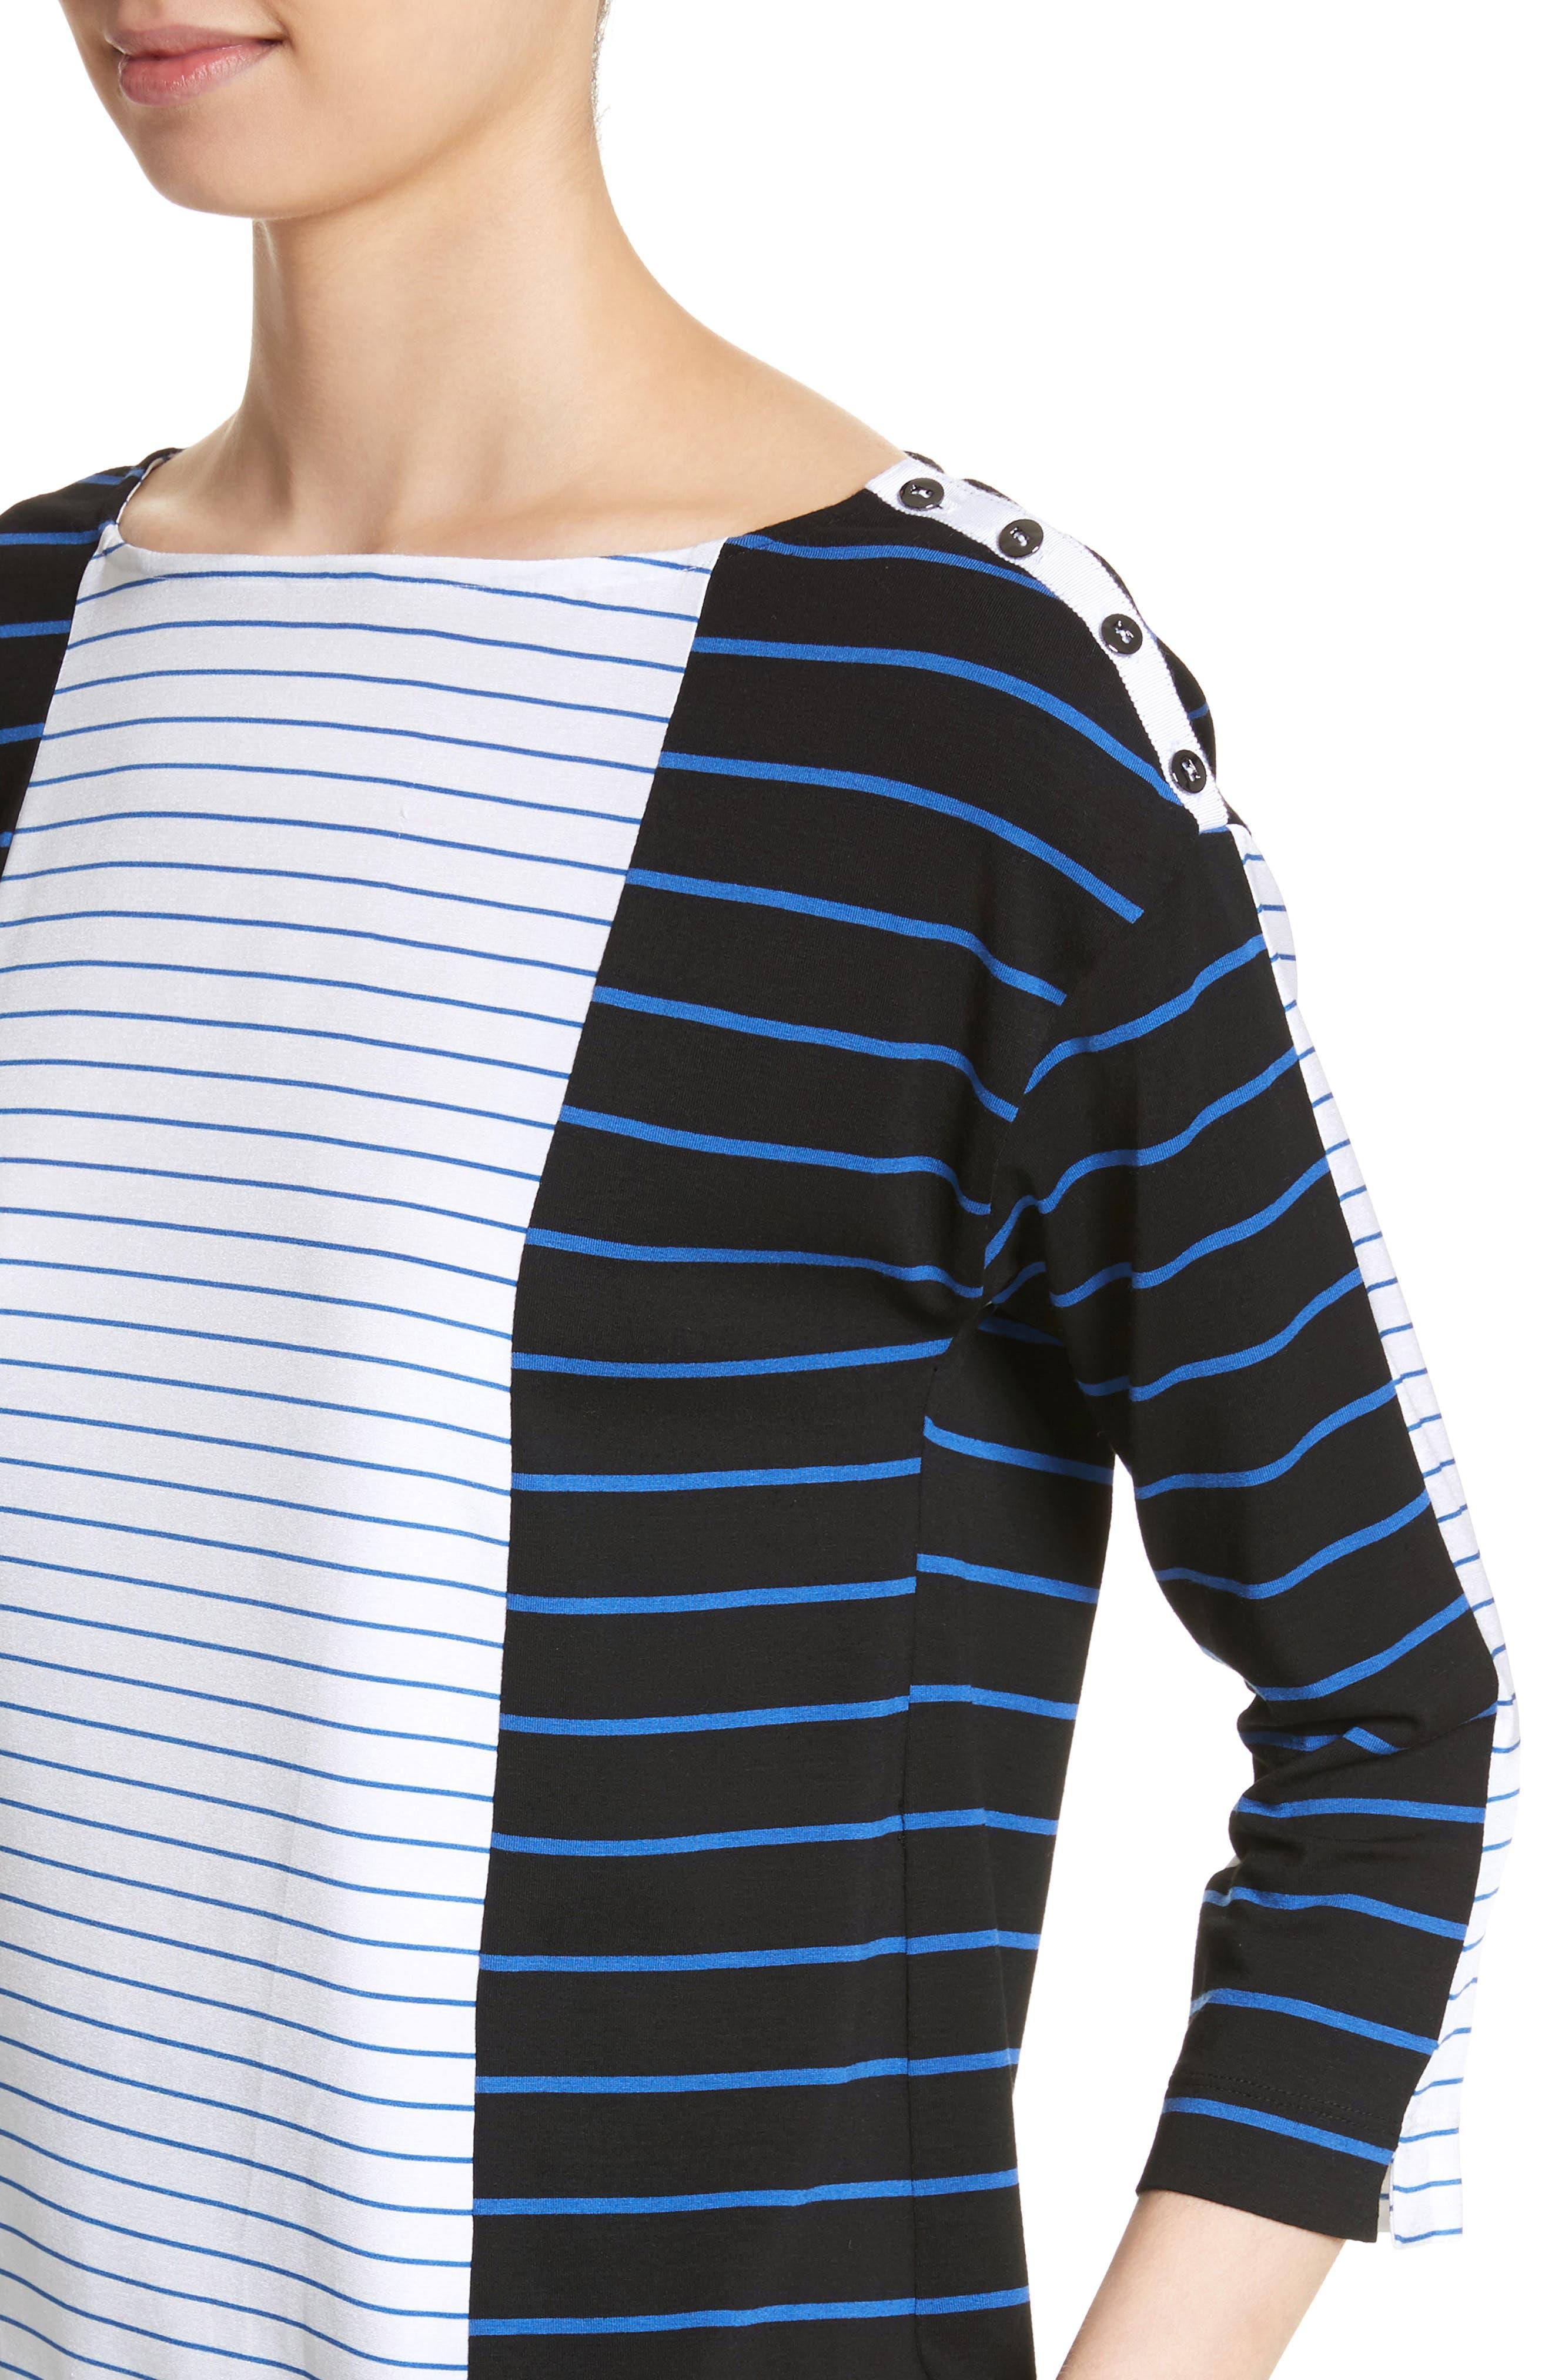 Yarn Dyed Stripe Jersey Top,                             Alternate thumbnail 4, color,                             Caviar/ Niagara/ Bianco